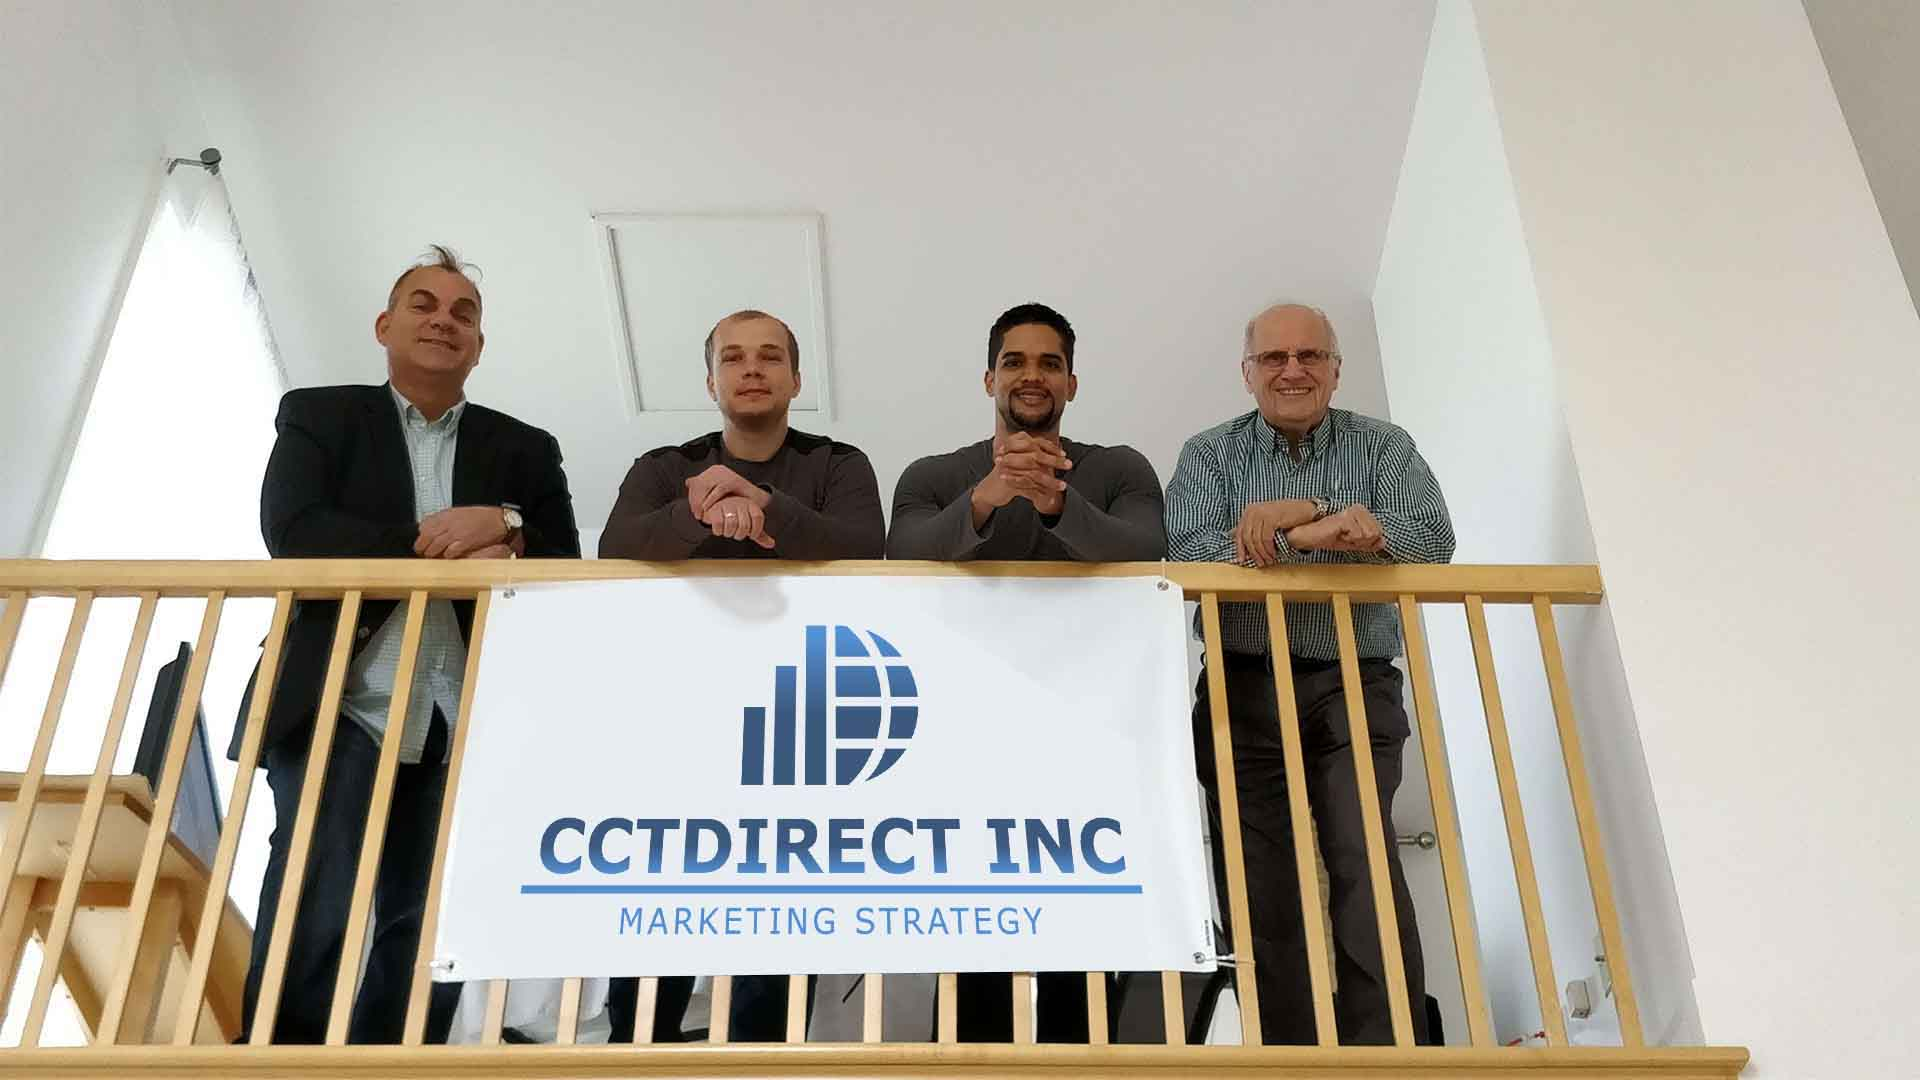 CCTDIRECT NEW LOGO